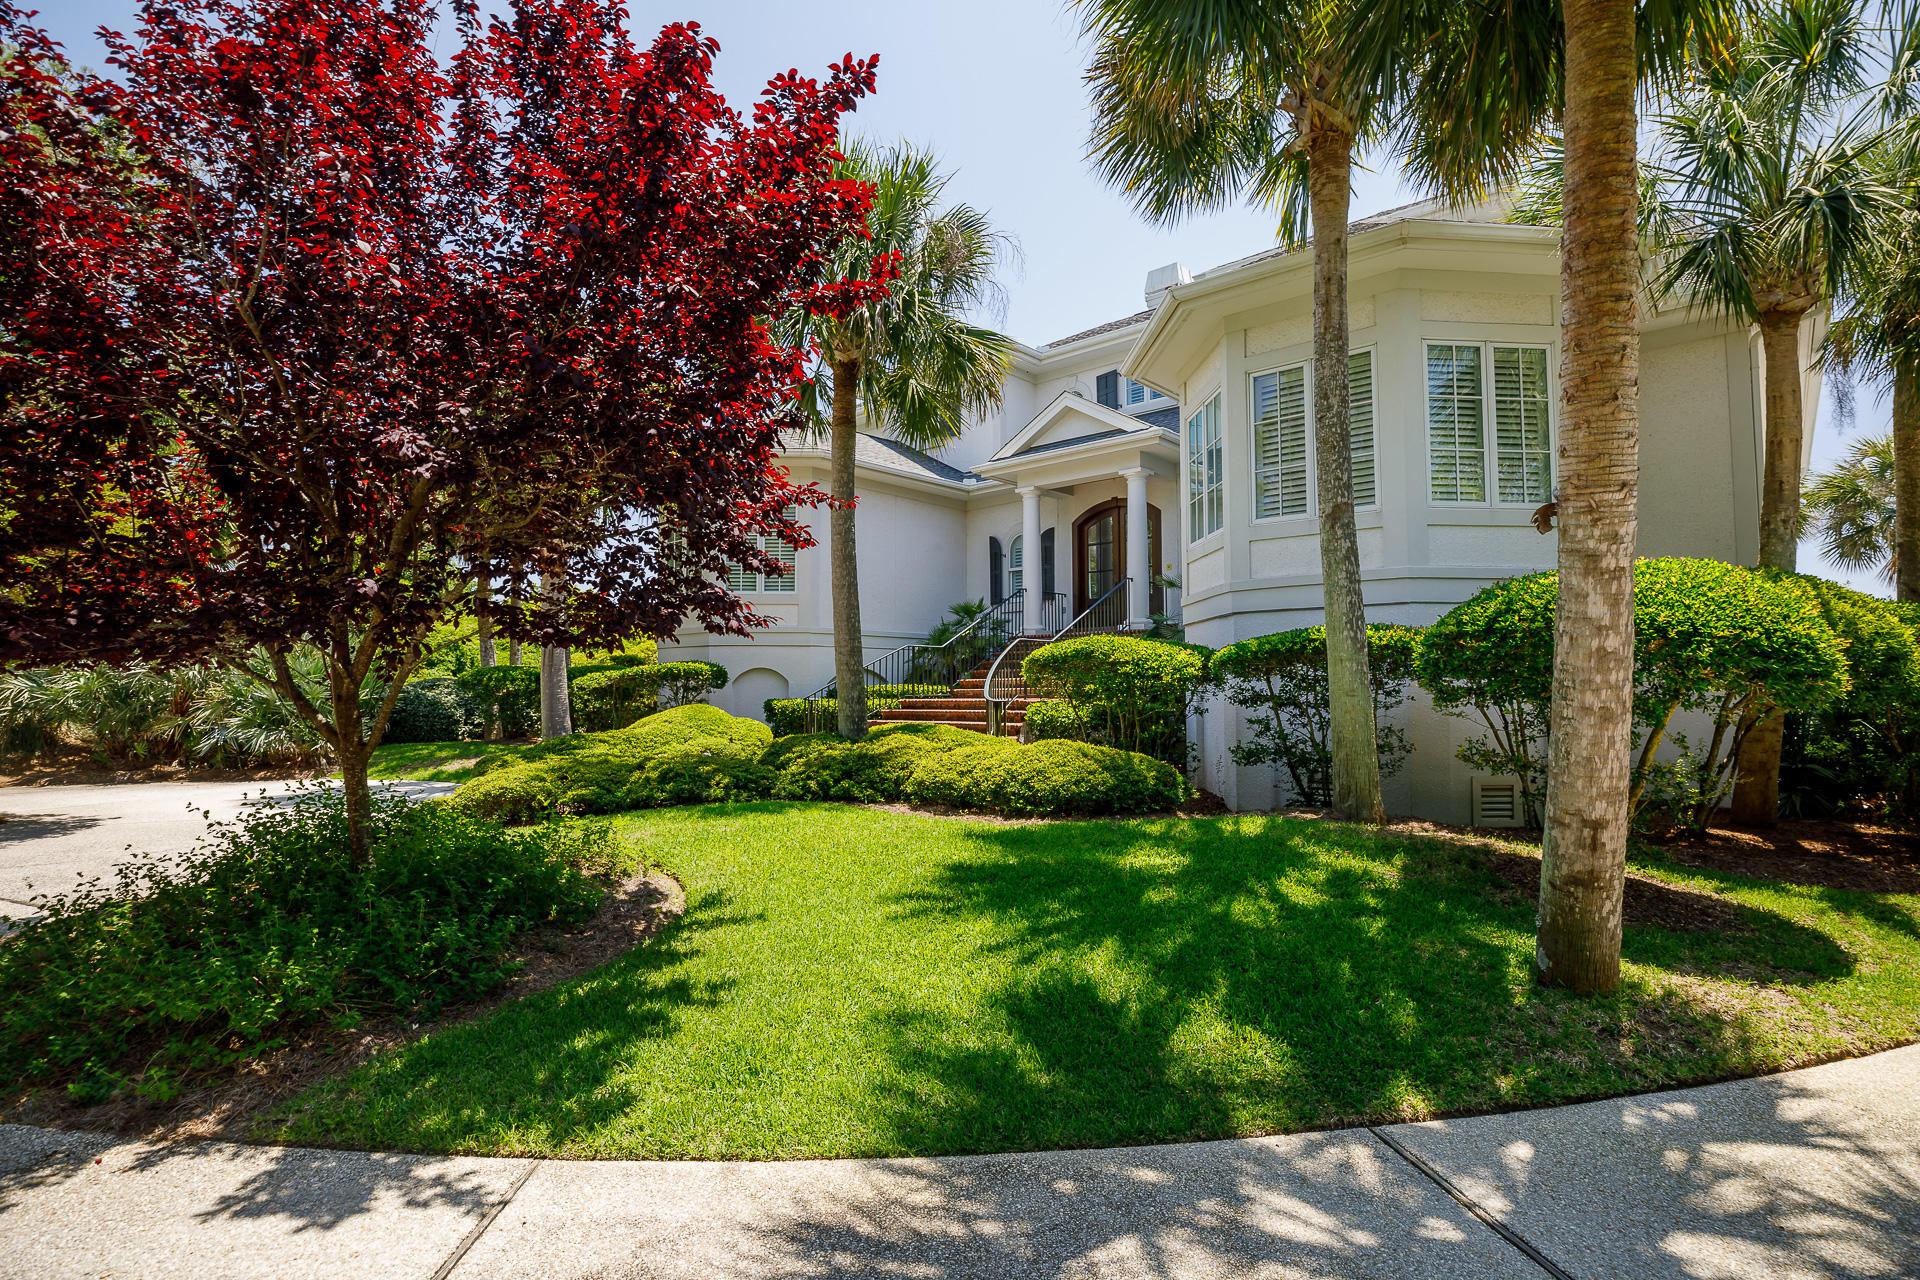 Seabrook Island Homes For Sale - 2216 Rolling Dune, Seabrook Island, SC - 15